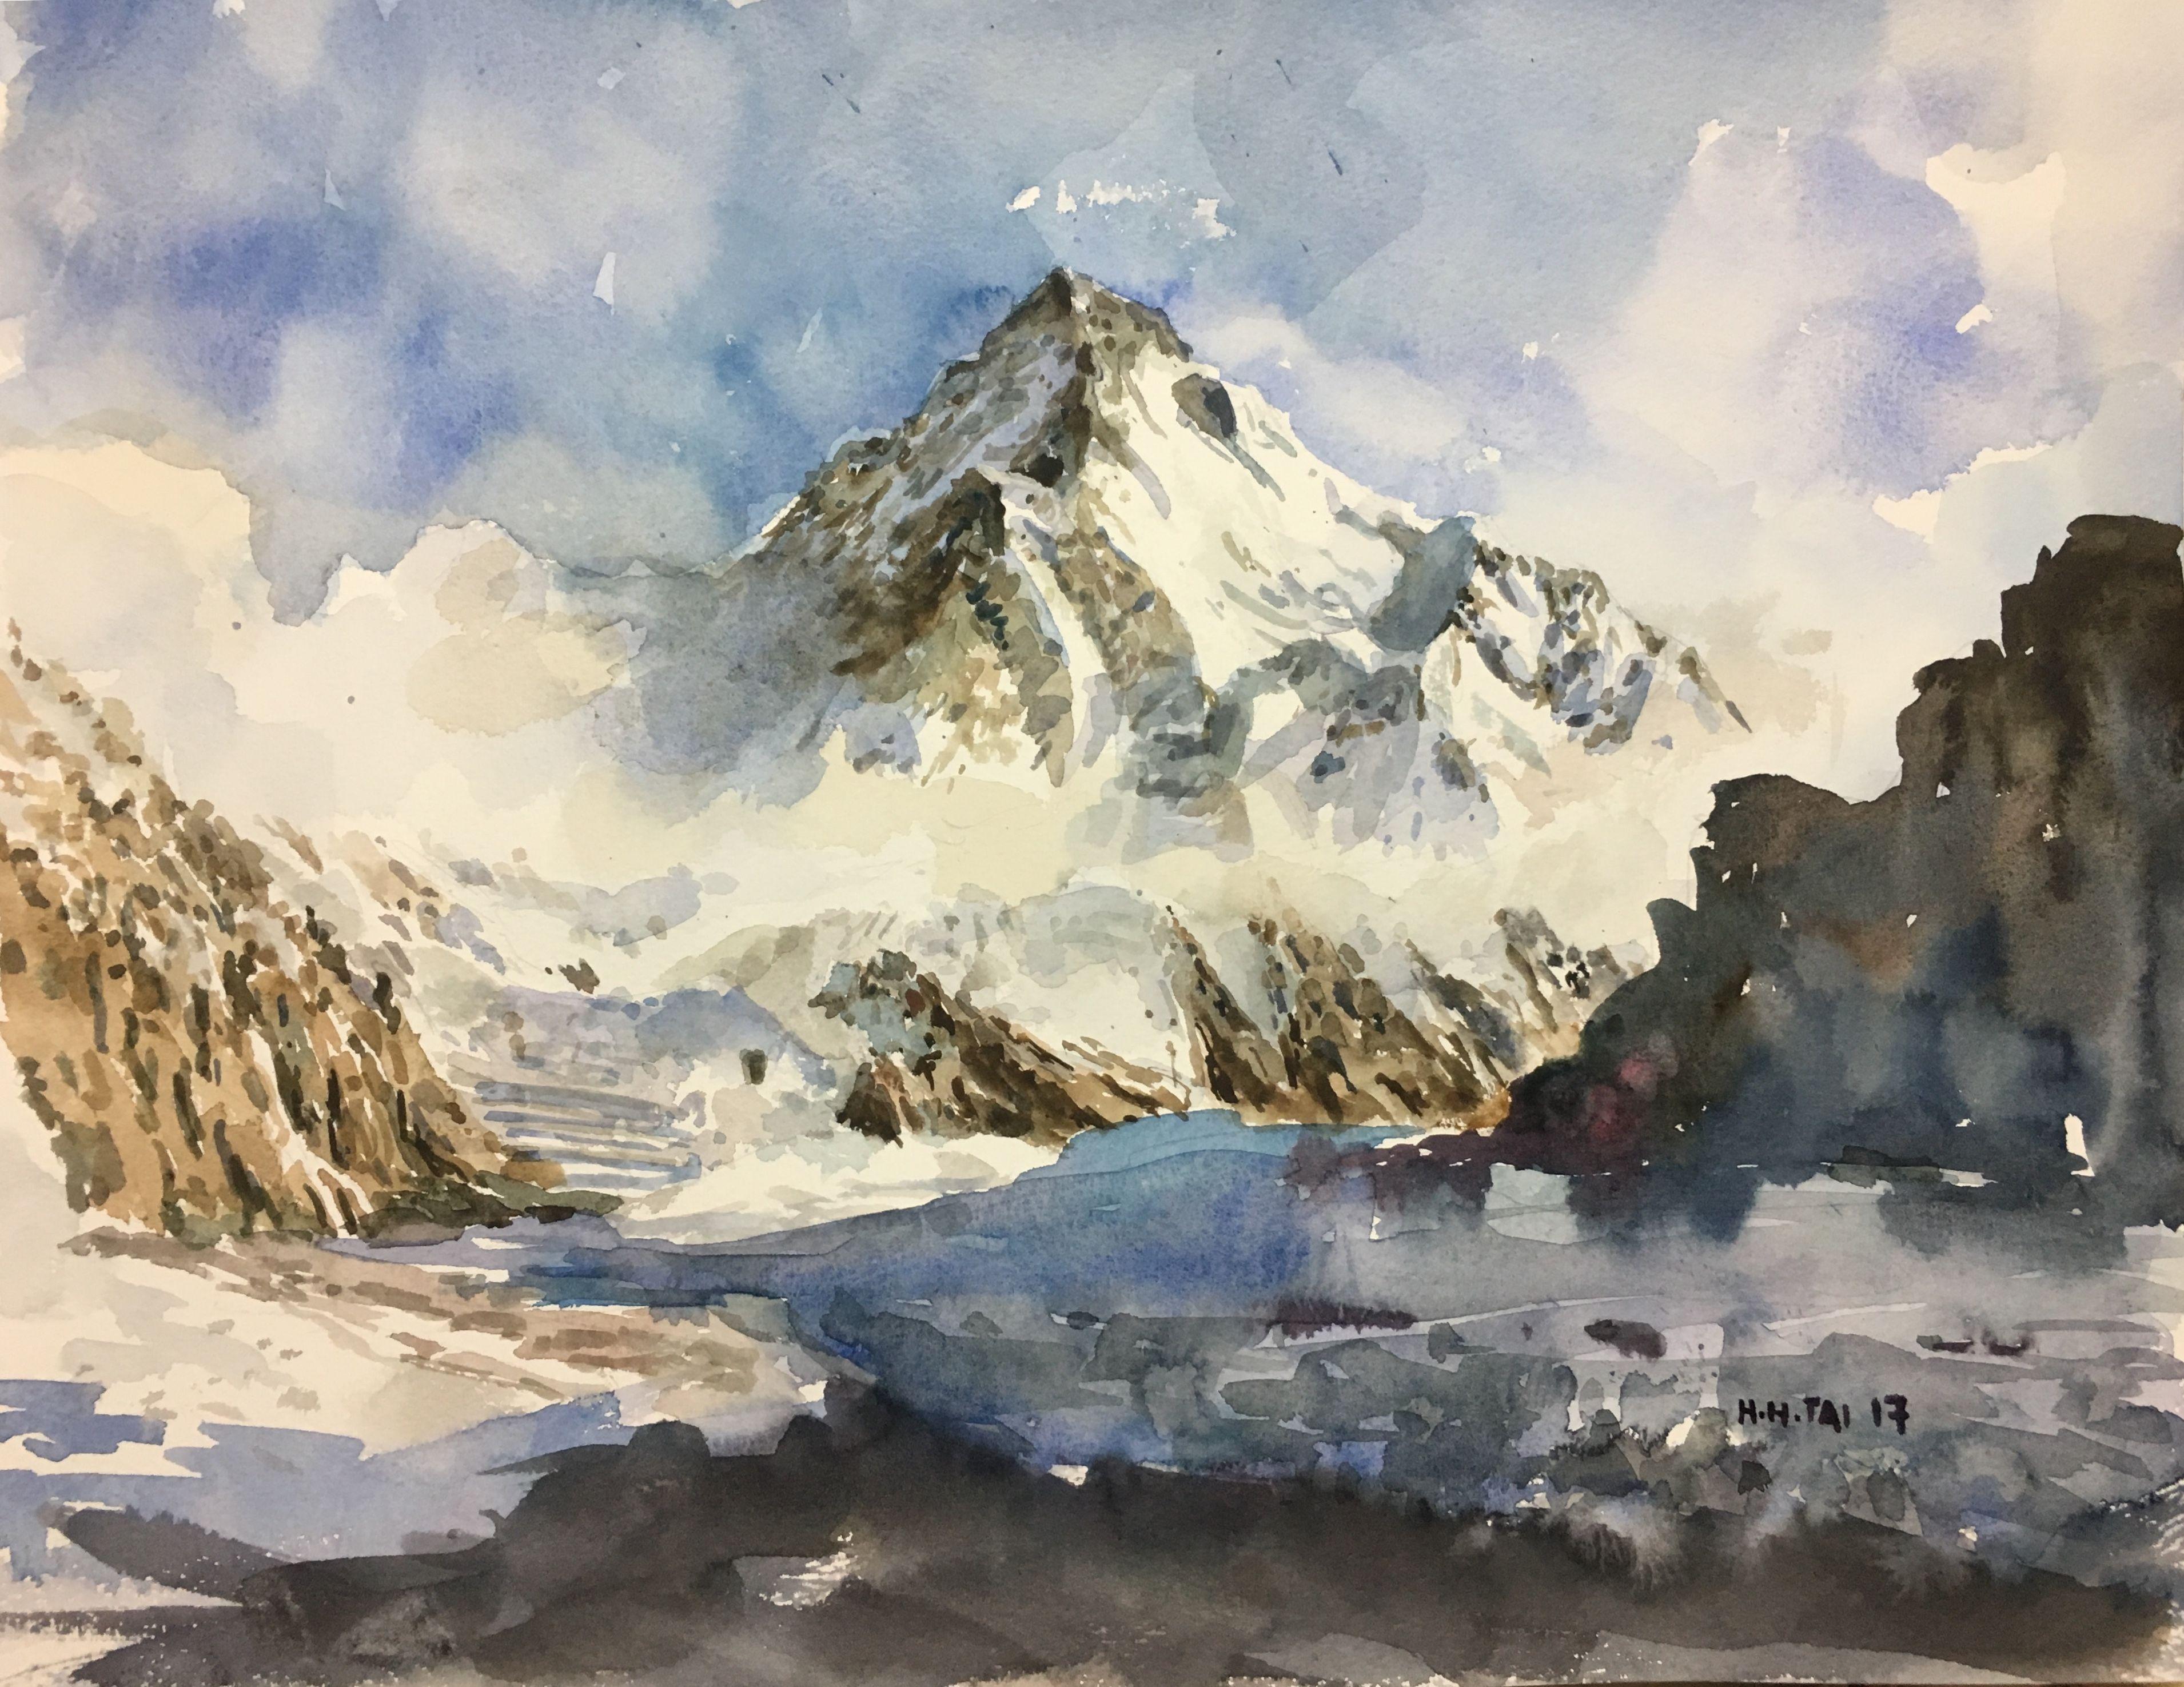 K2 Savage Mountain Watercolour By Brian Tai Watercolor Mountains Landscape Mountains